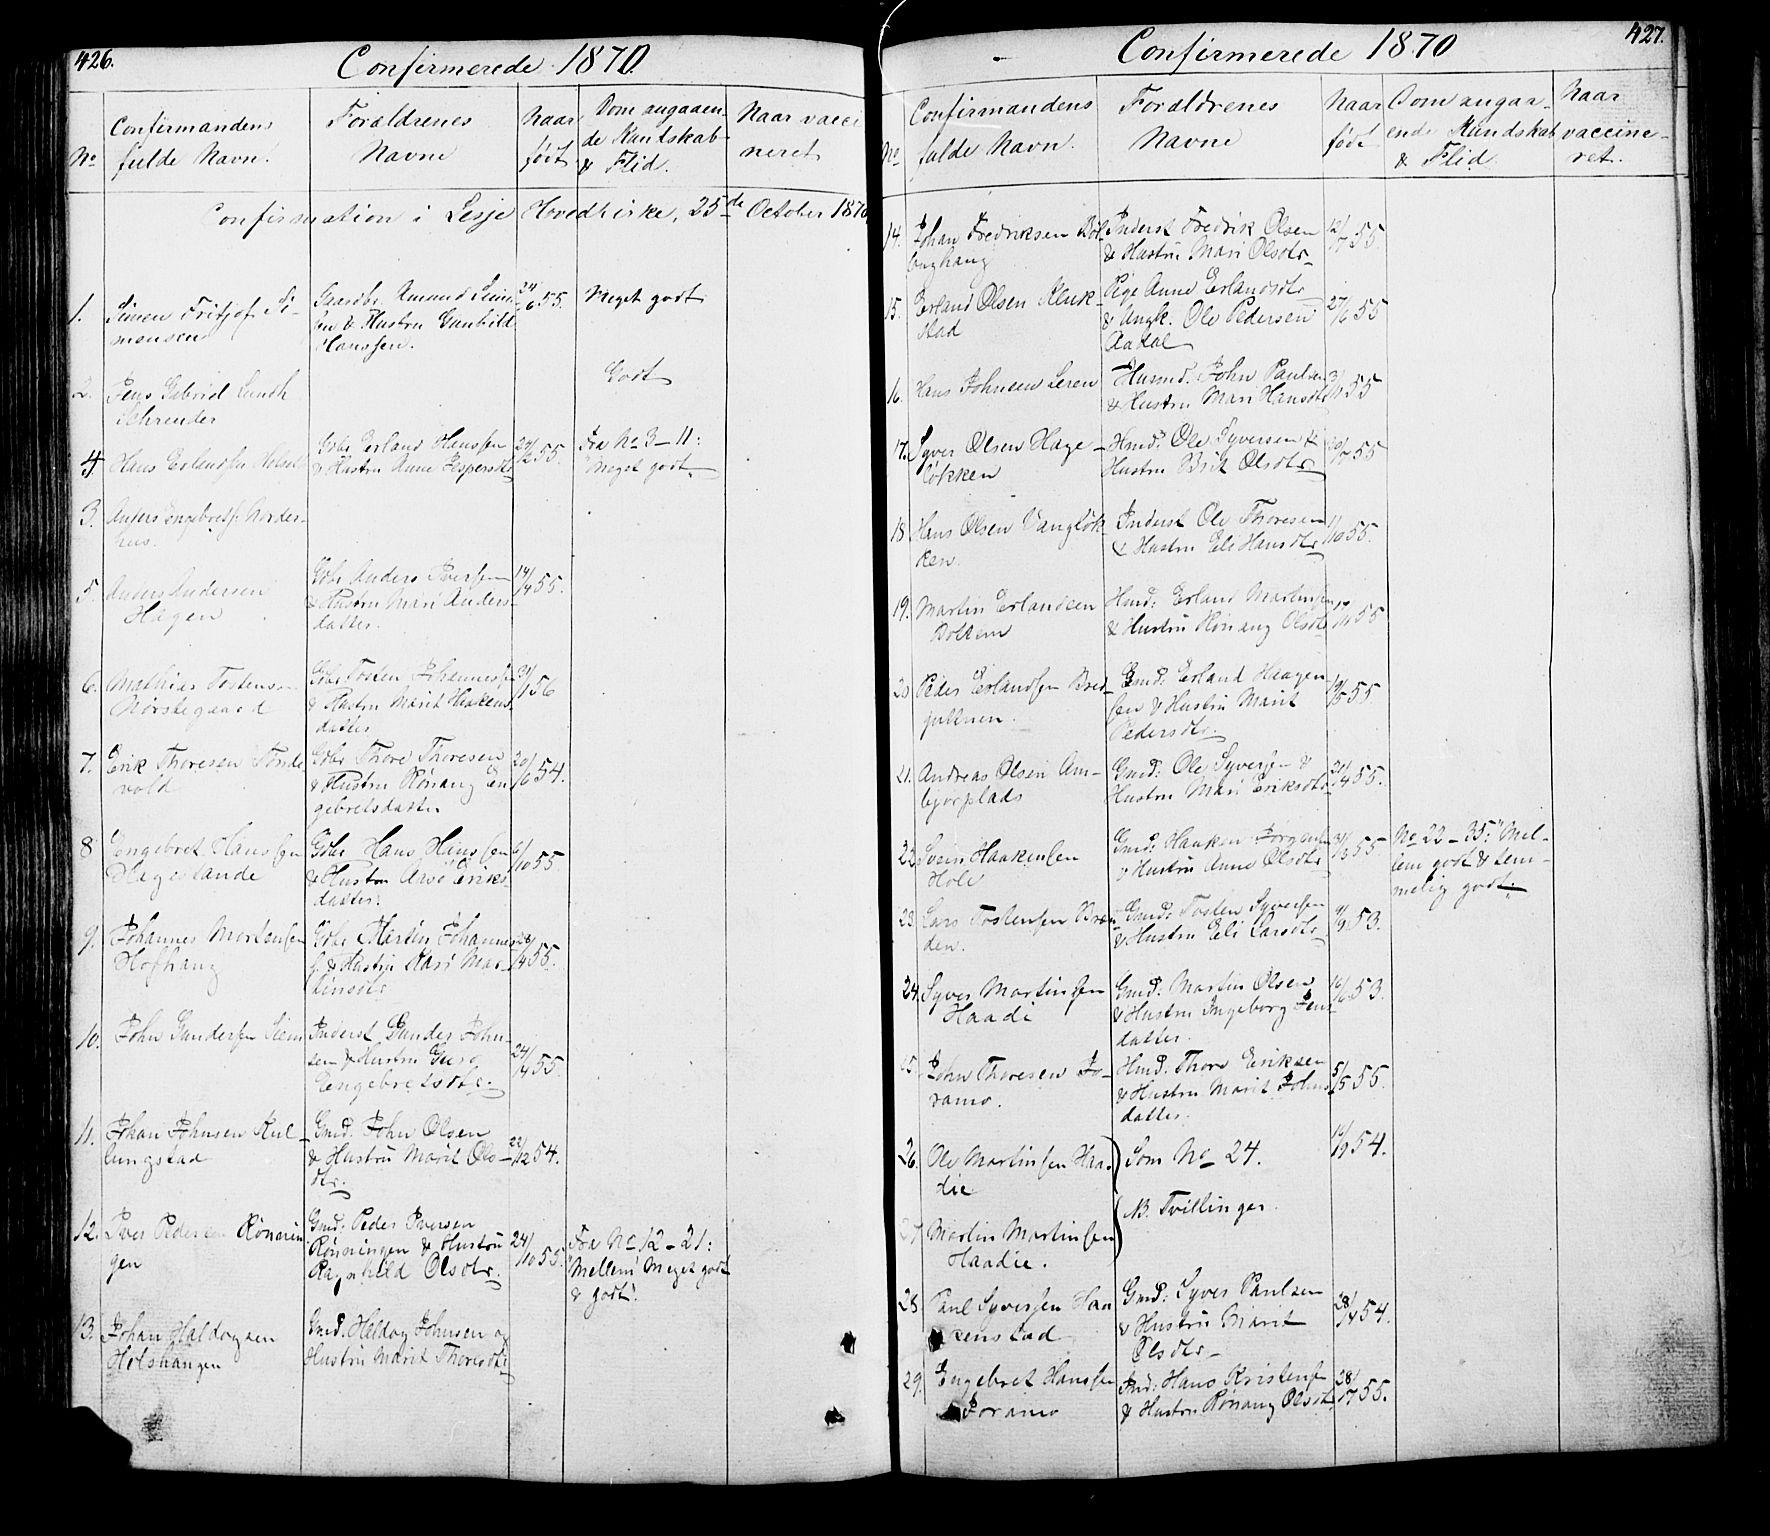 SAH, Lesja prestekontor, Klokkerbok nr. 5, 1850-1894, s. 426-427